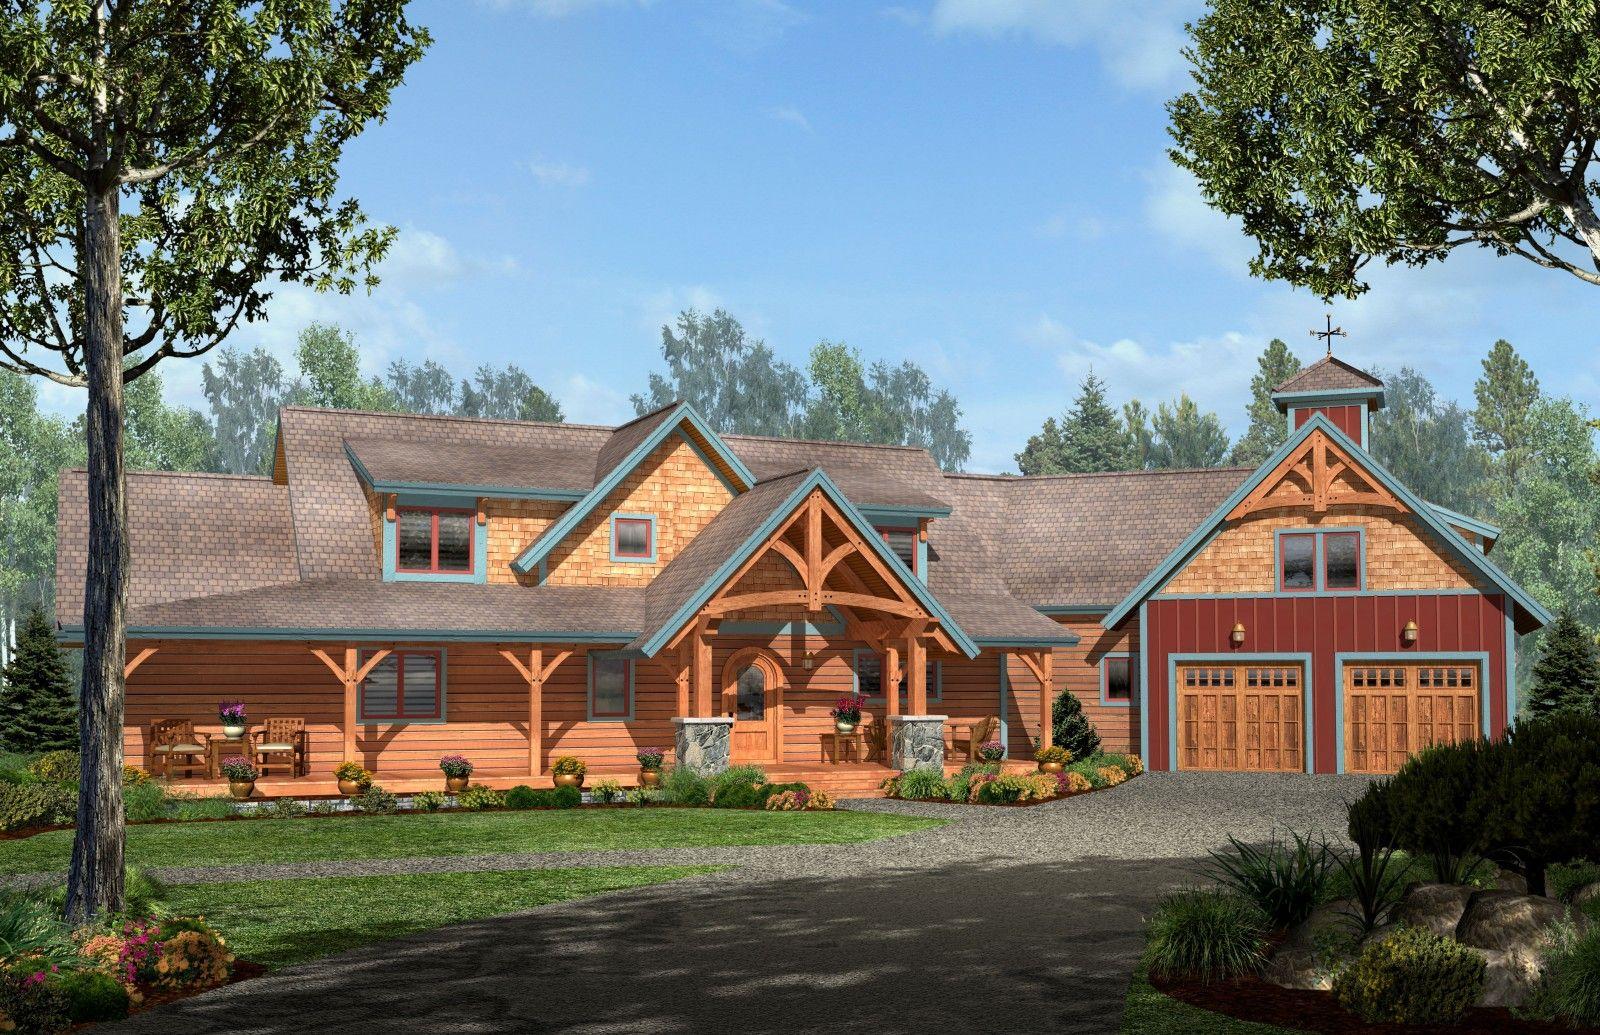 Sagamore From The Adirondack Series Lake House Plans Lake House Small Lake Houses